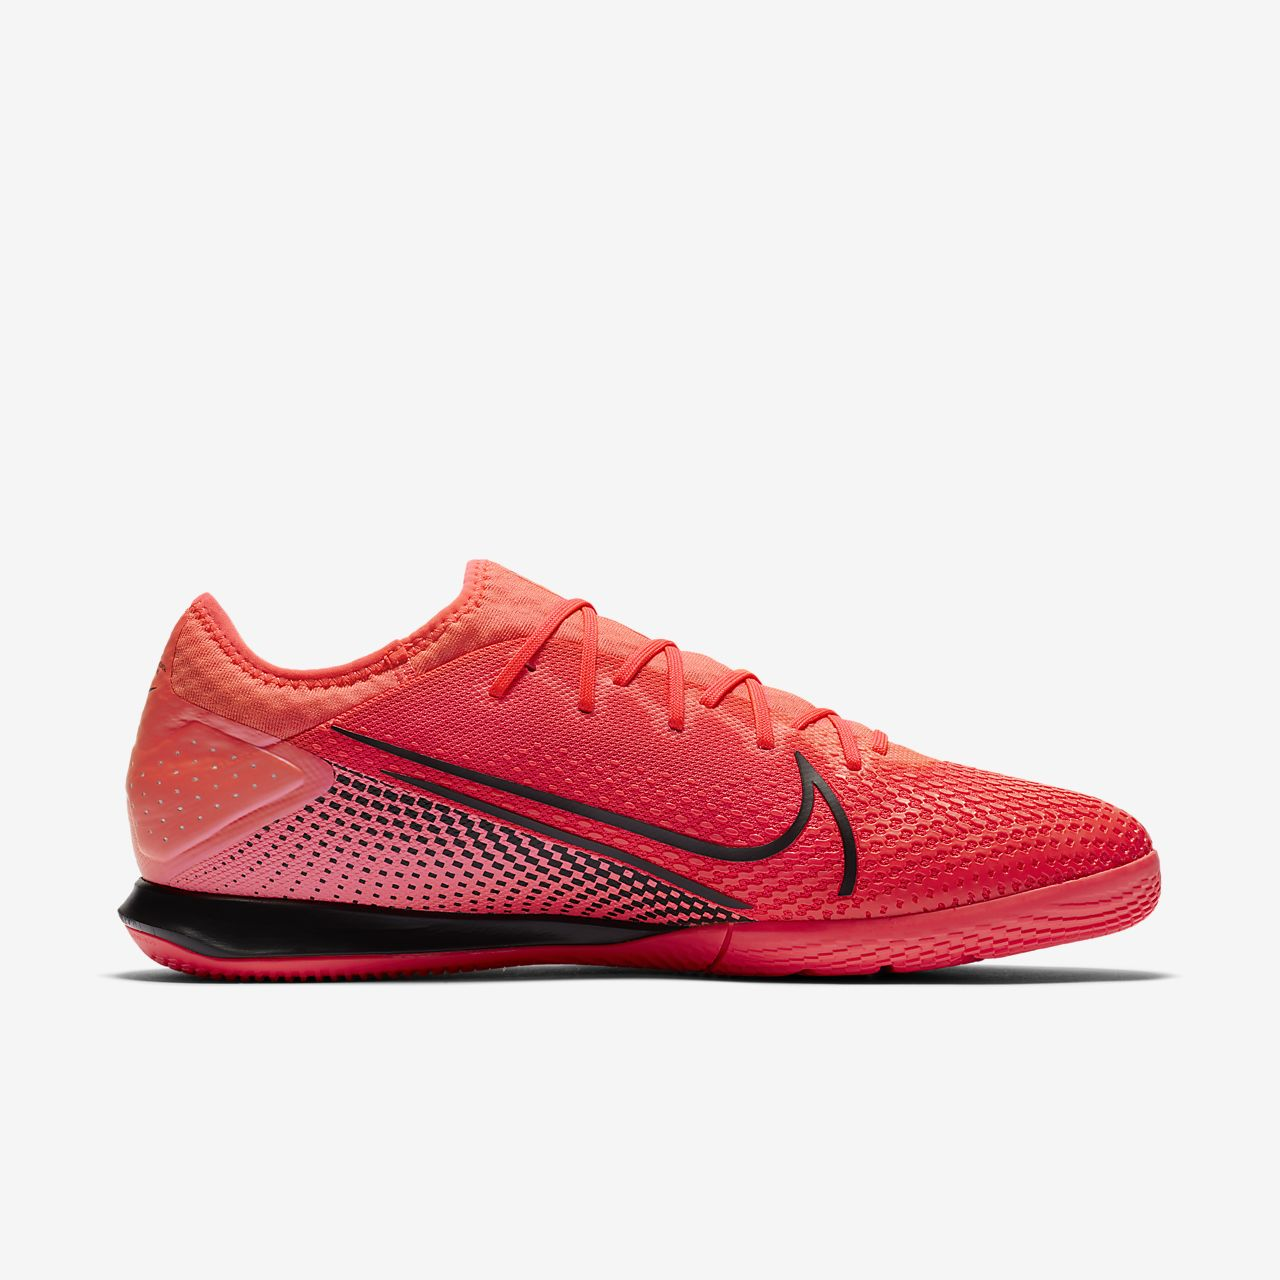 Chelsea F. C. Nike Air Max Fußballschuh Nike Mercurial Vapor